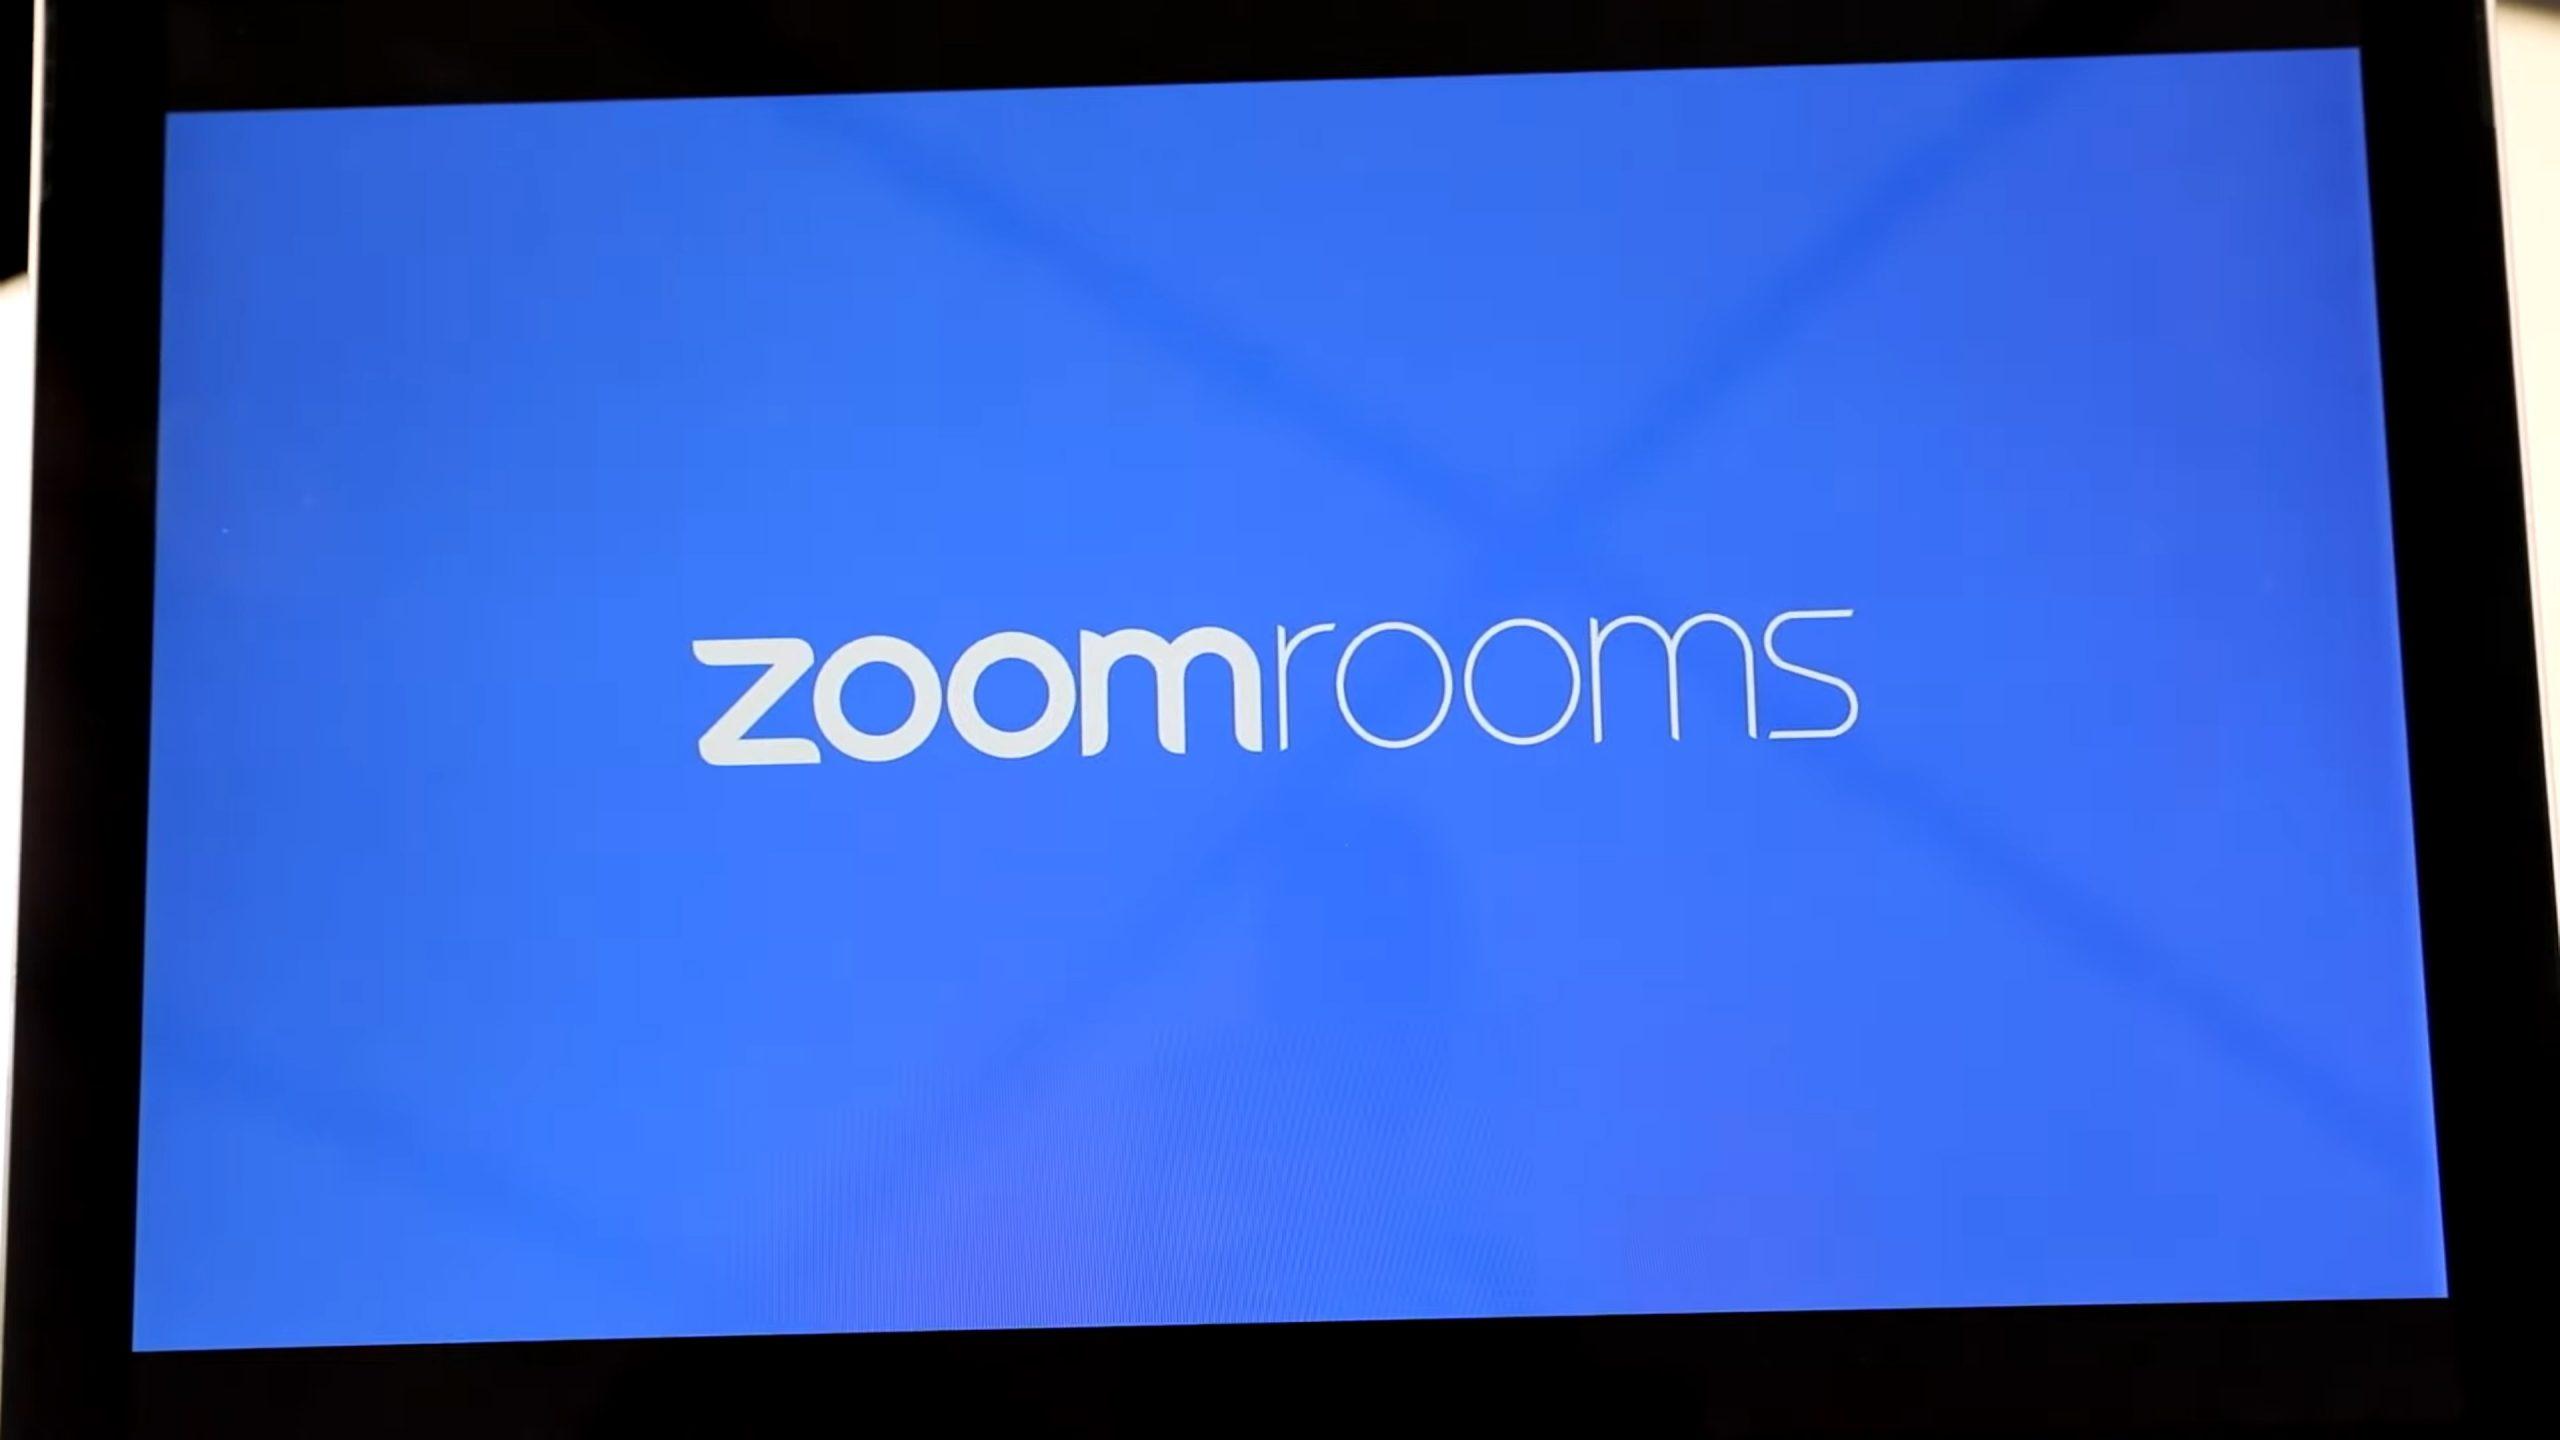 Zoom Rooms logo